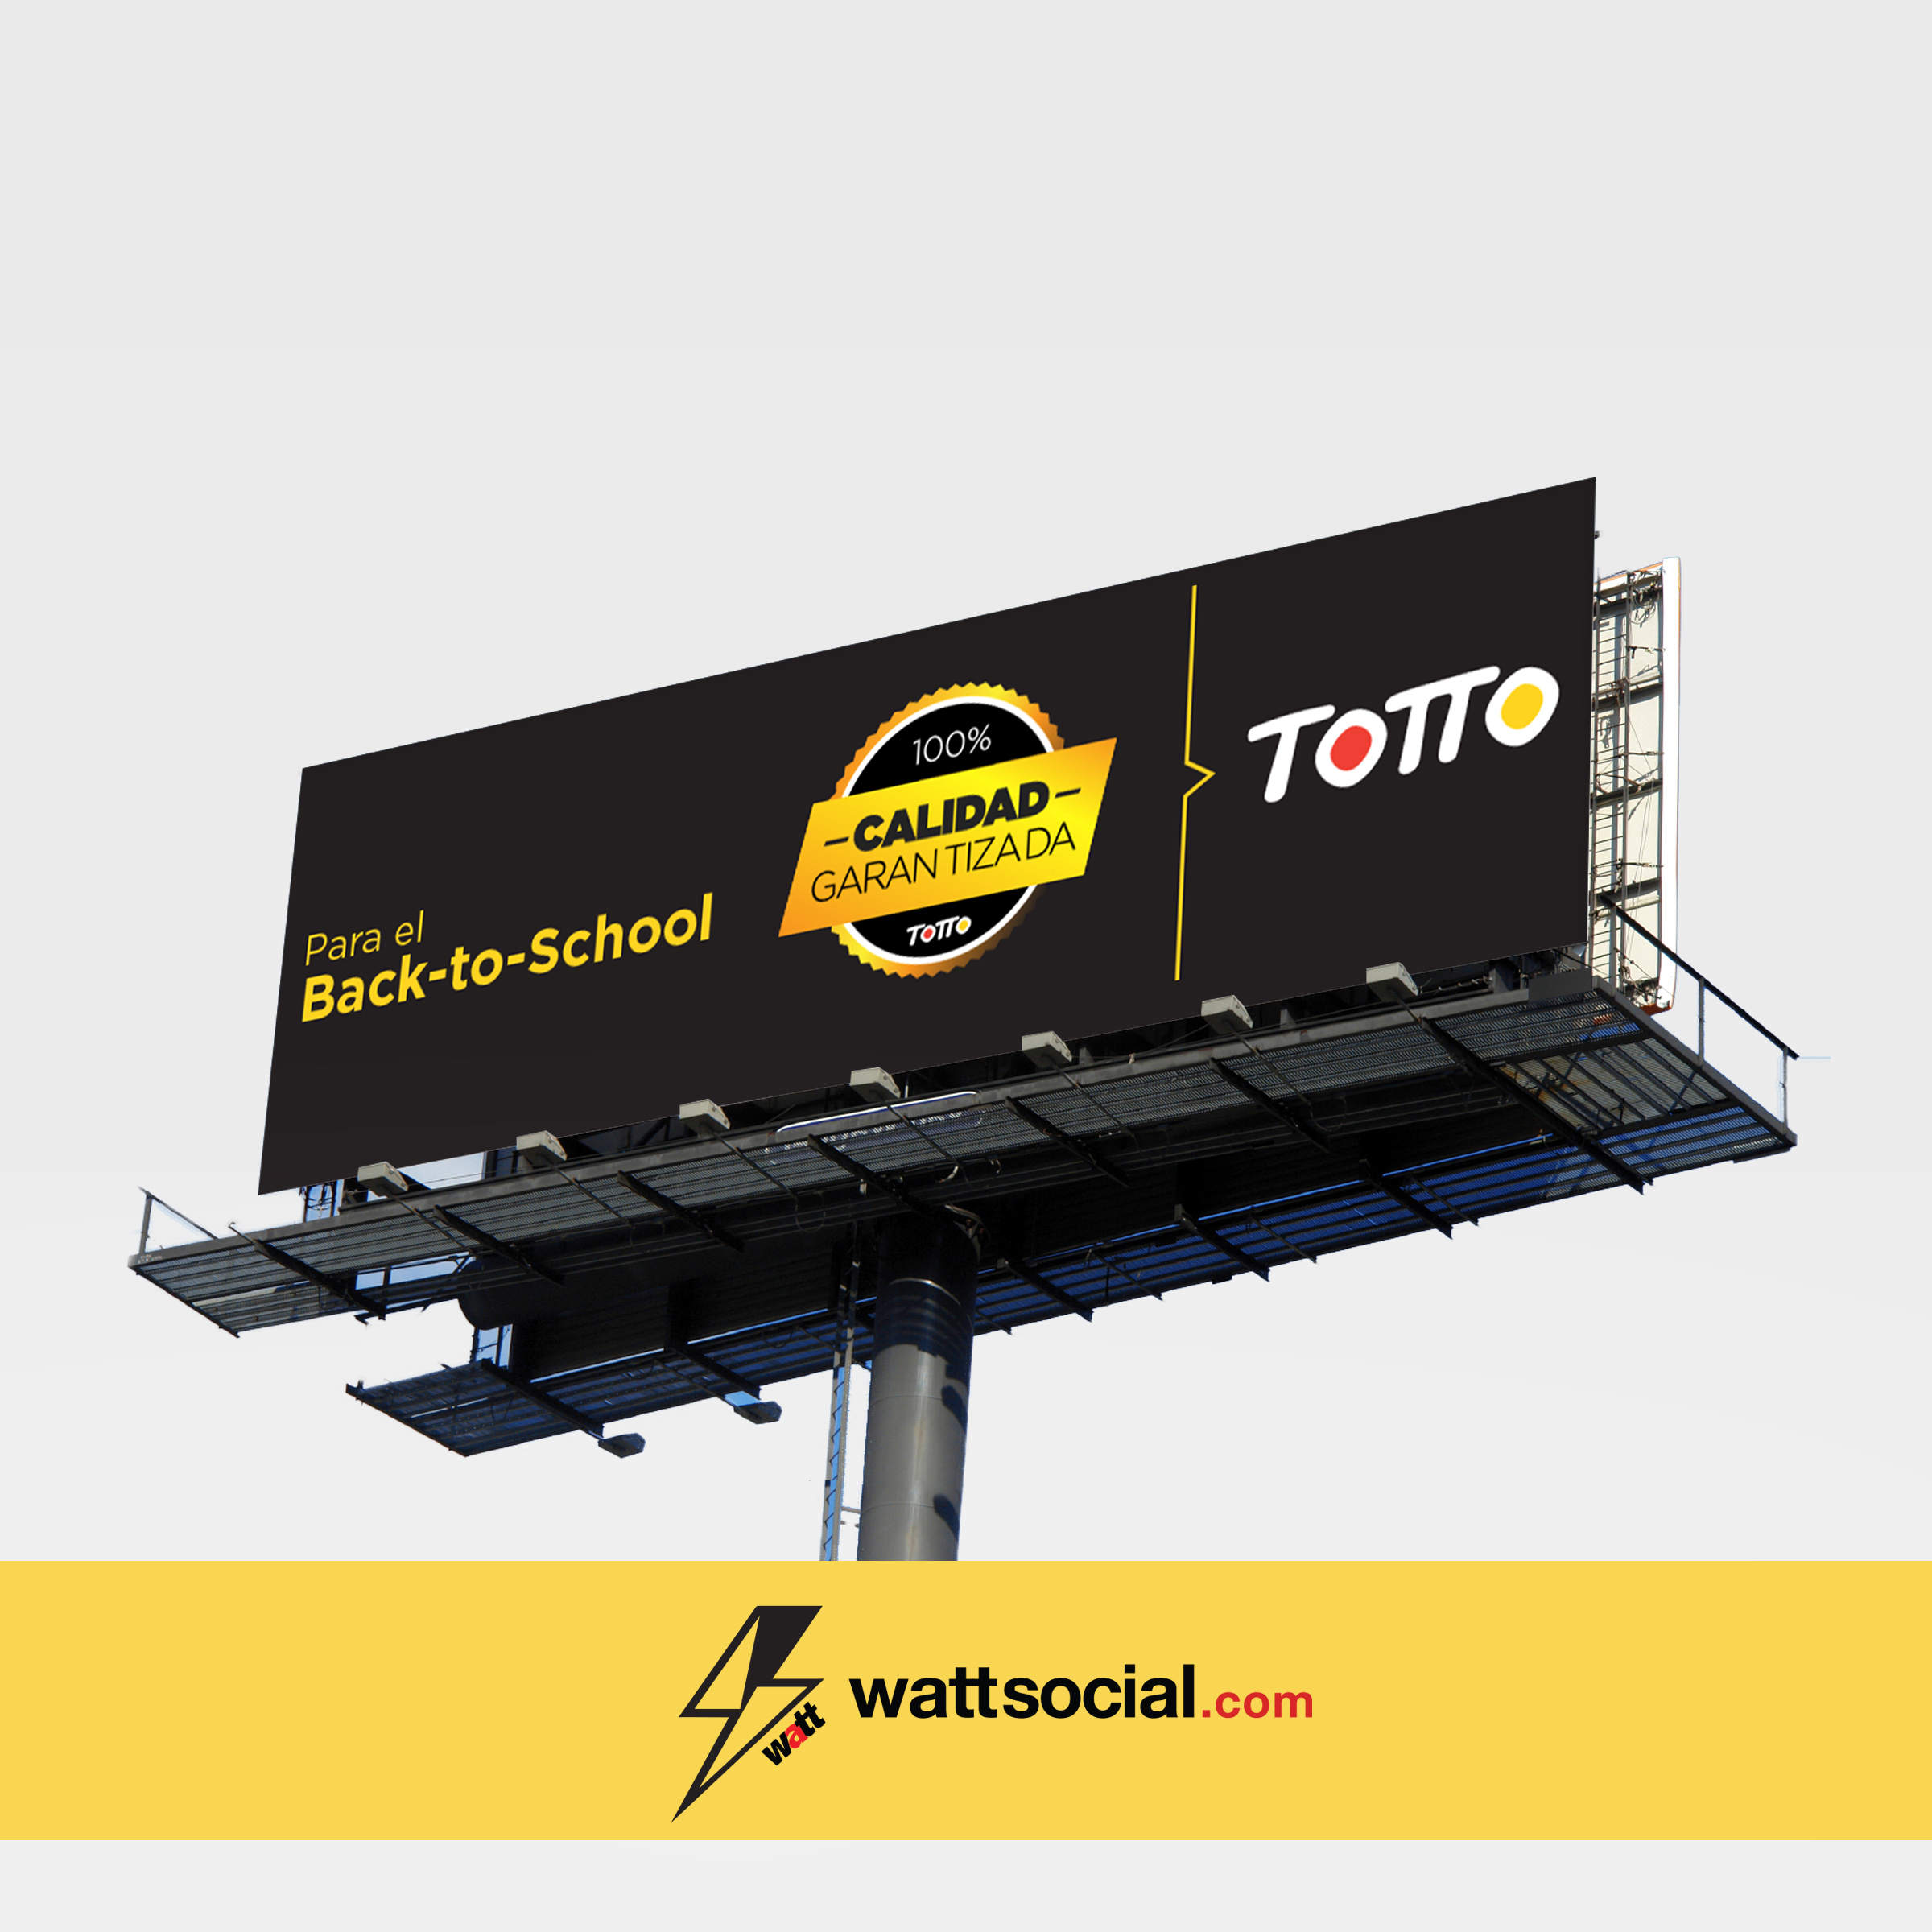 wtt-billboard-totto2.jpg